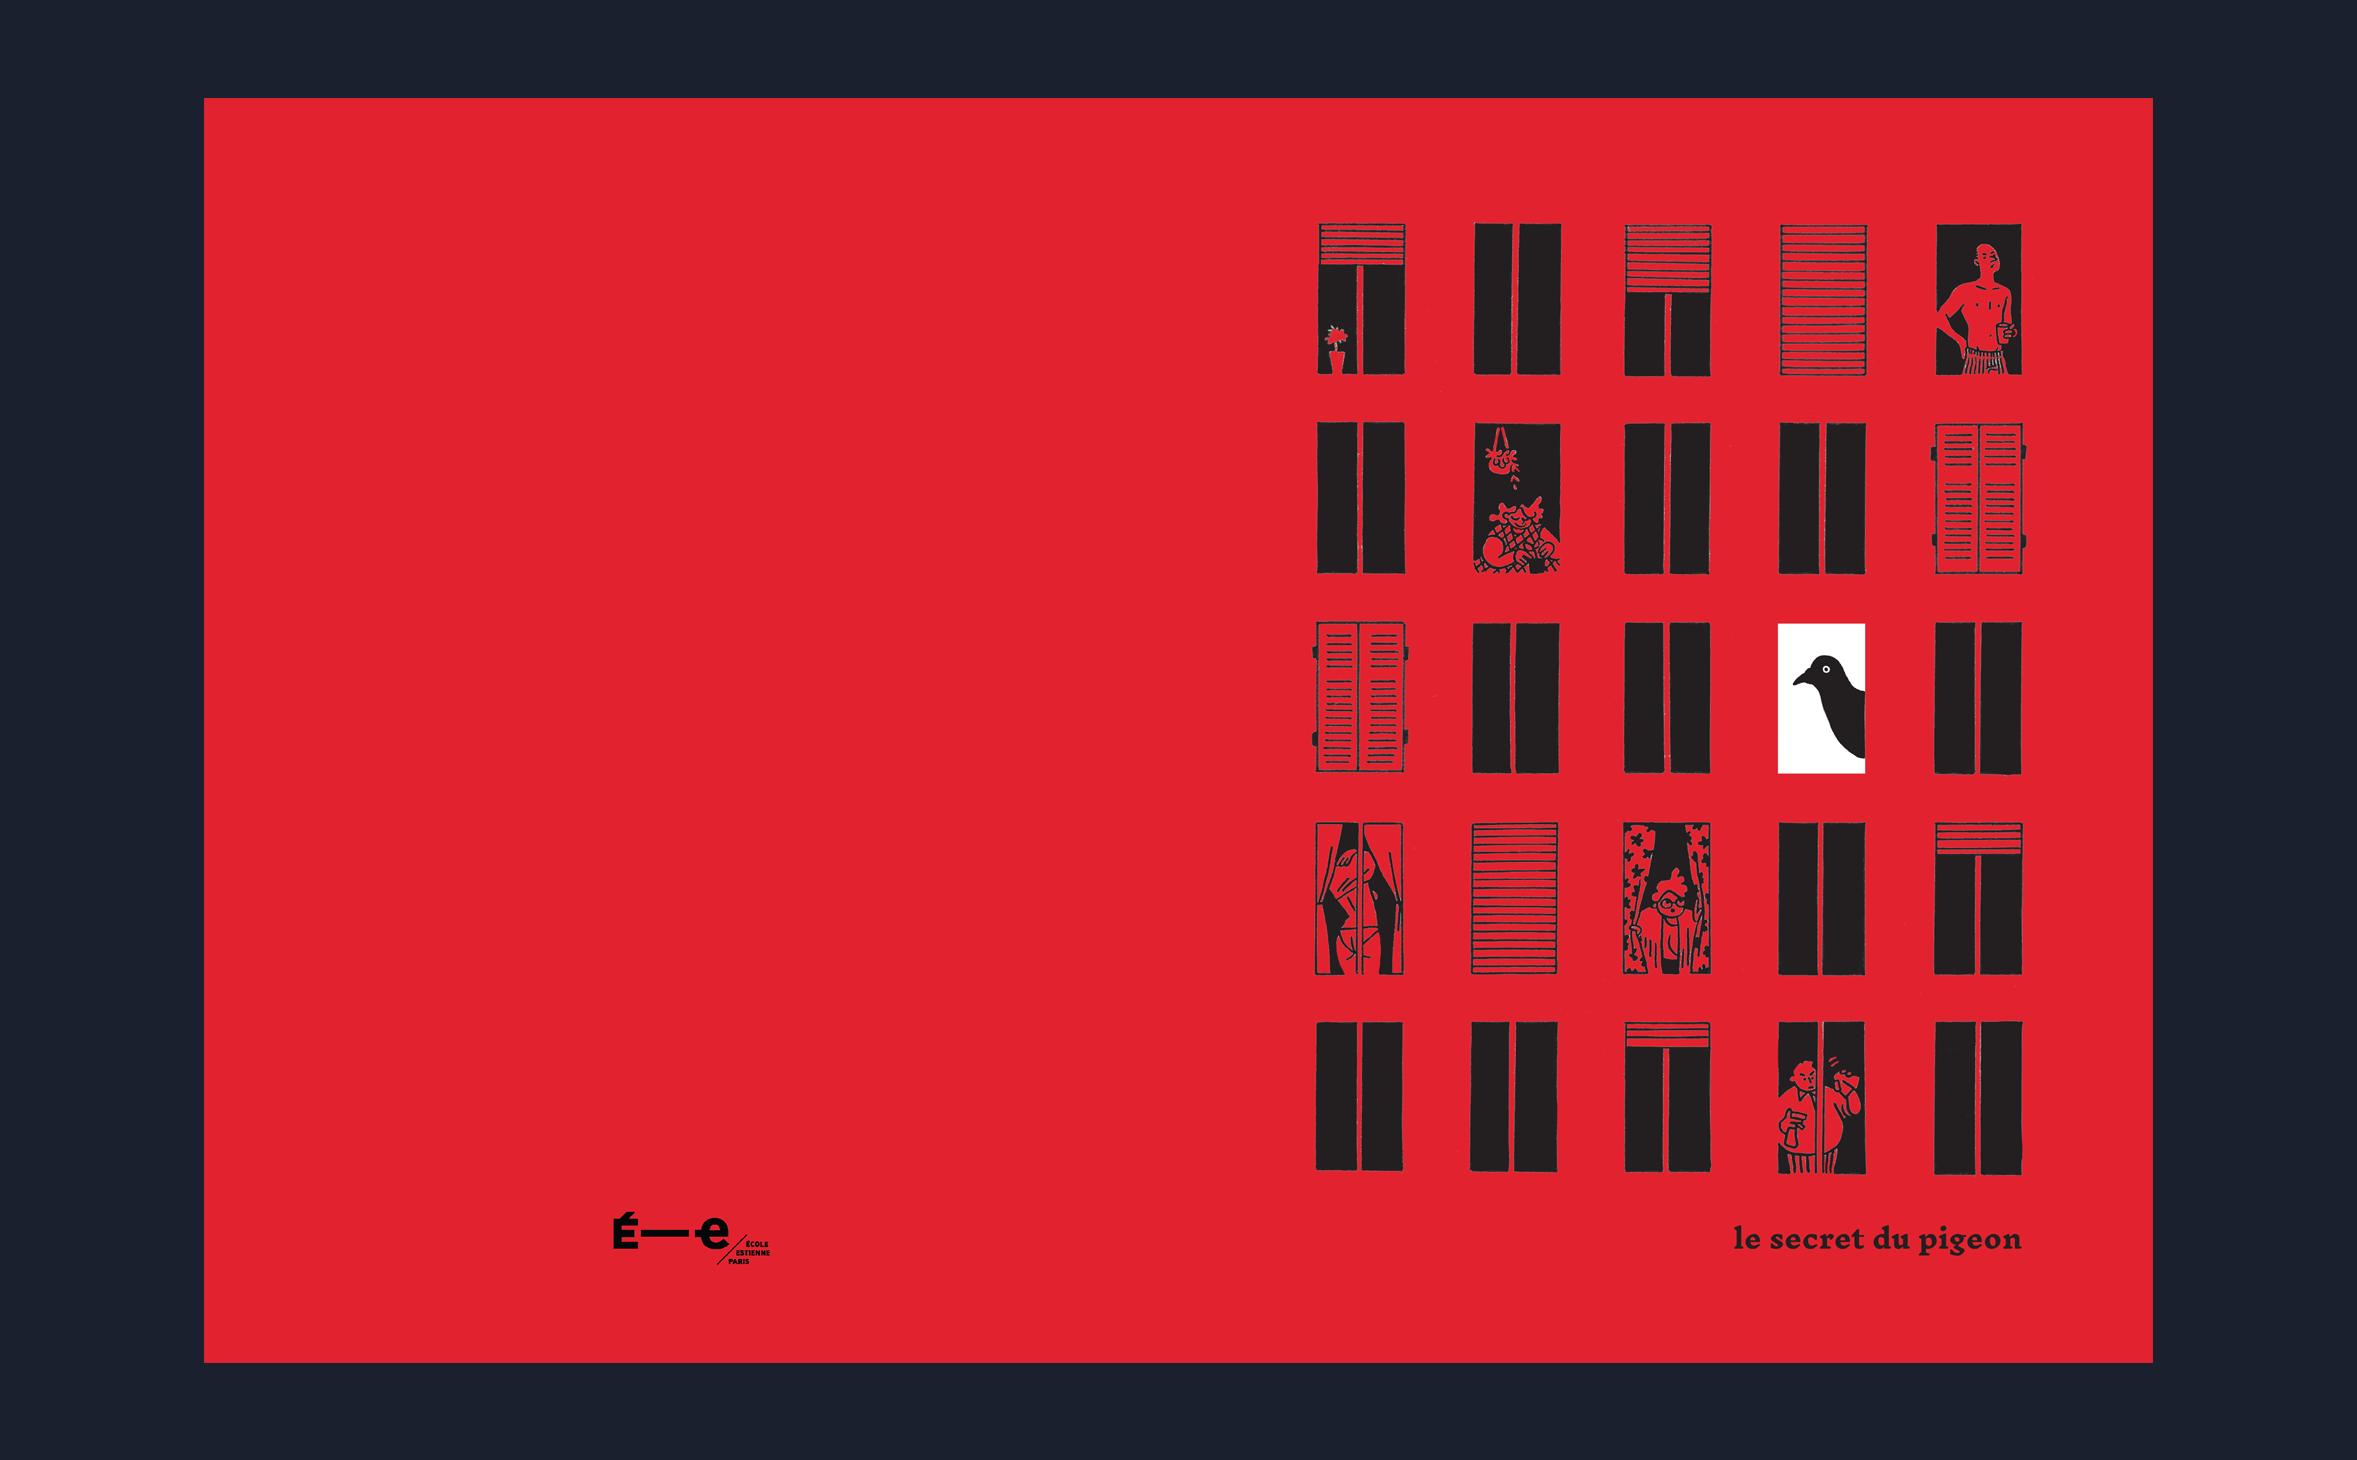 Cover of Le Secret du Pigeon, Master's thesis on urban evolution